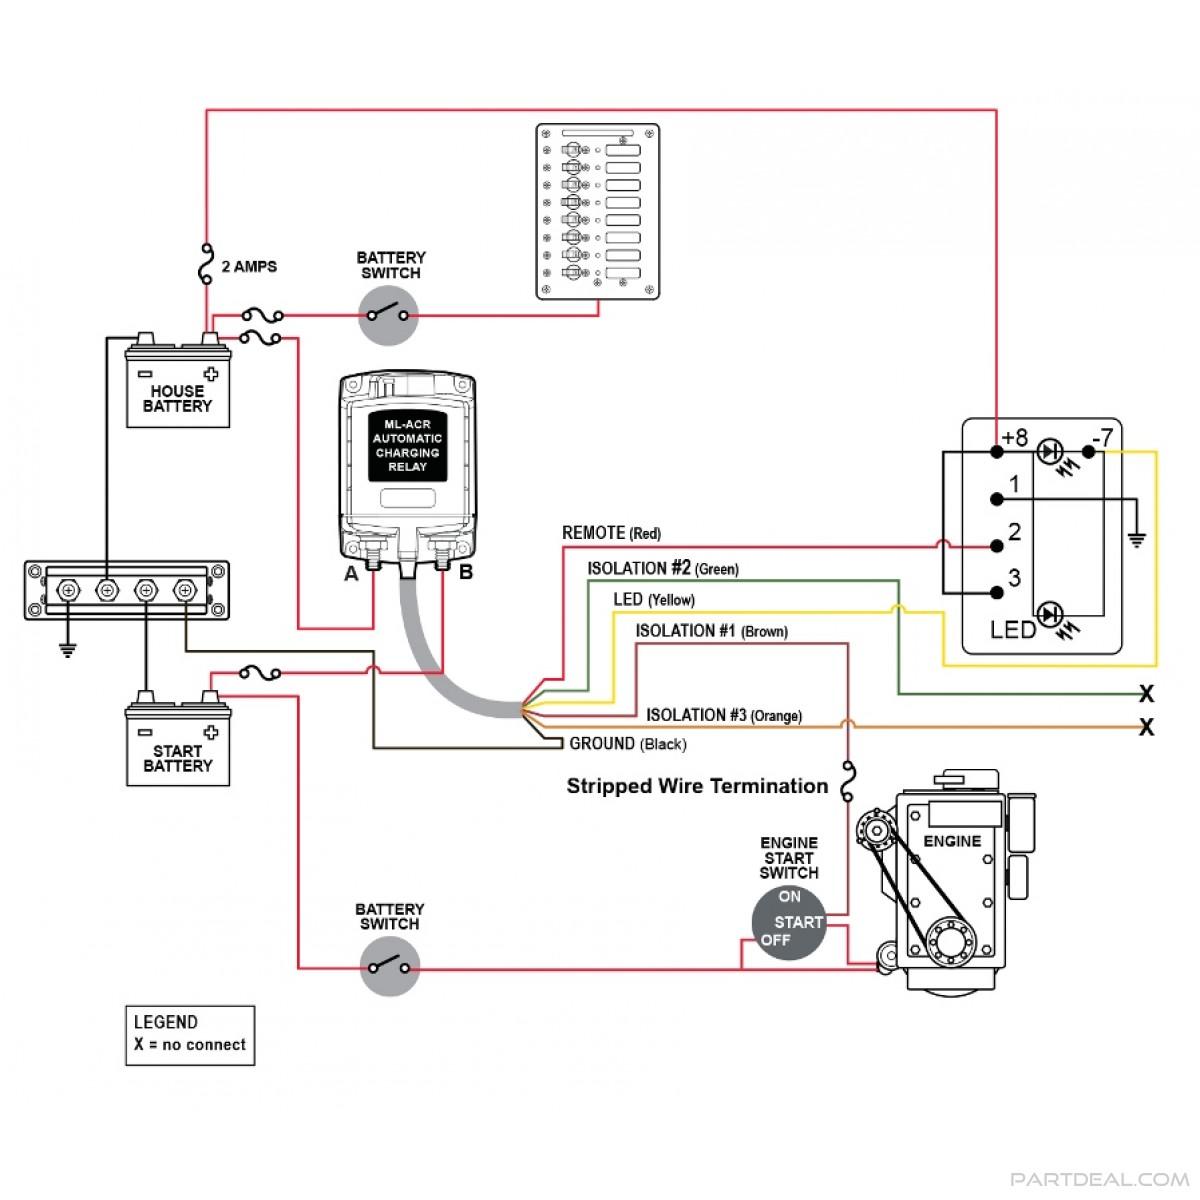 cole hersee trailer wiring diagram la 6620  wiring diagram dual battery hook up diagram cole hersee  wiring diagram dual battery hook up